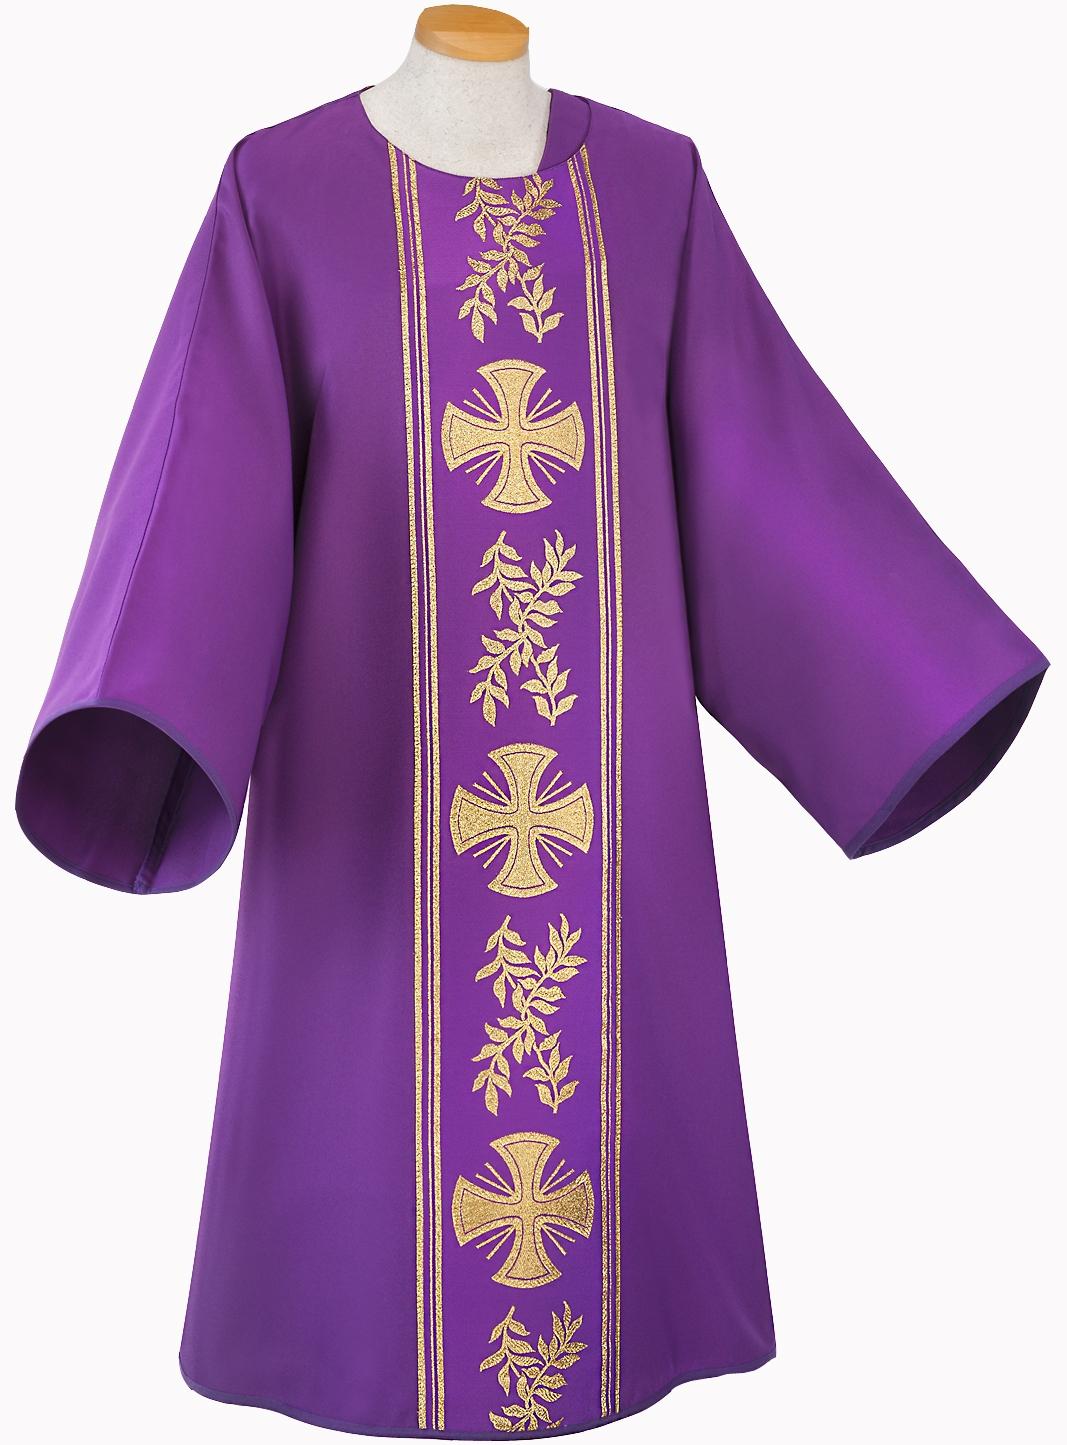 Dalmatik mit Stola, violett